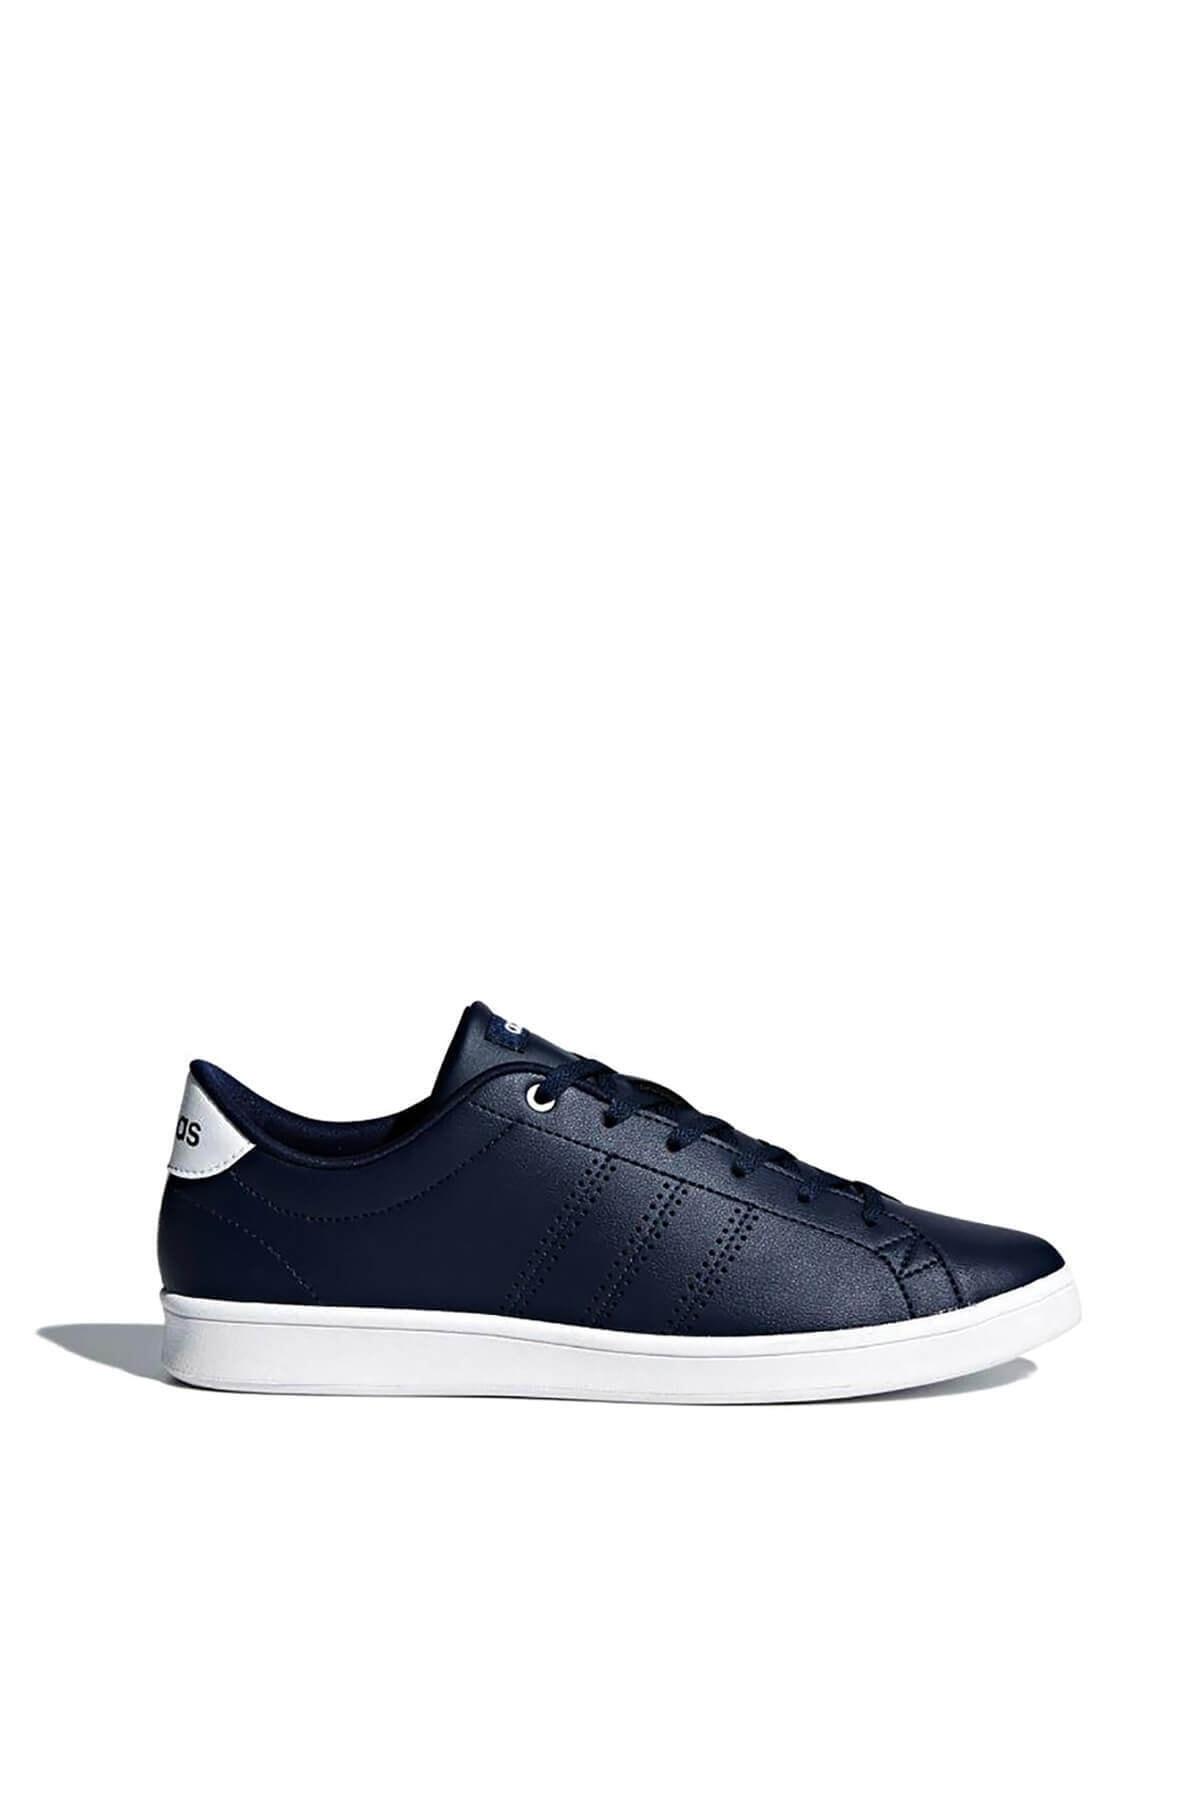 adidas ADVANTAGE CLEAN QT  CONAV Lacivert Kadın Sneaker Ayakkabı 100473489 1